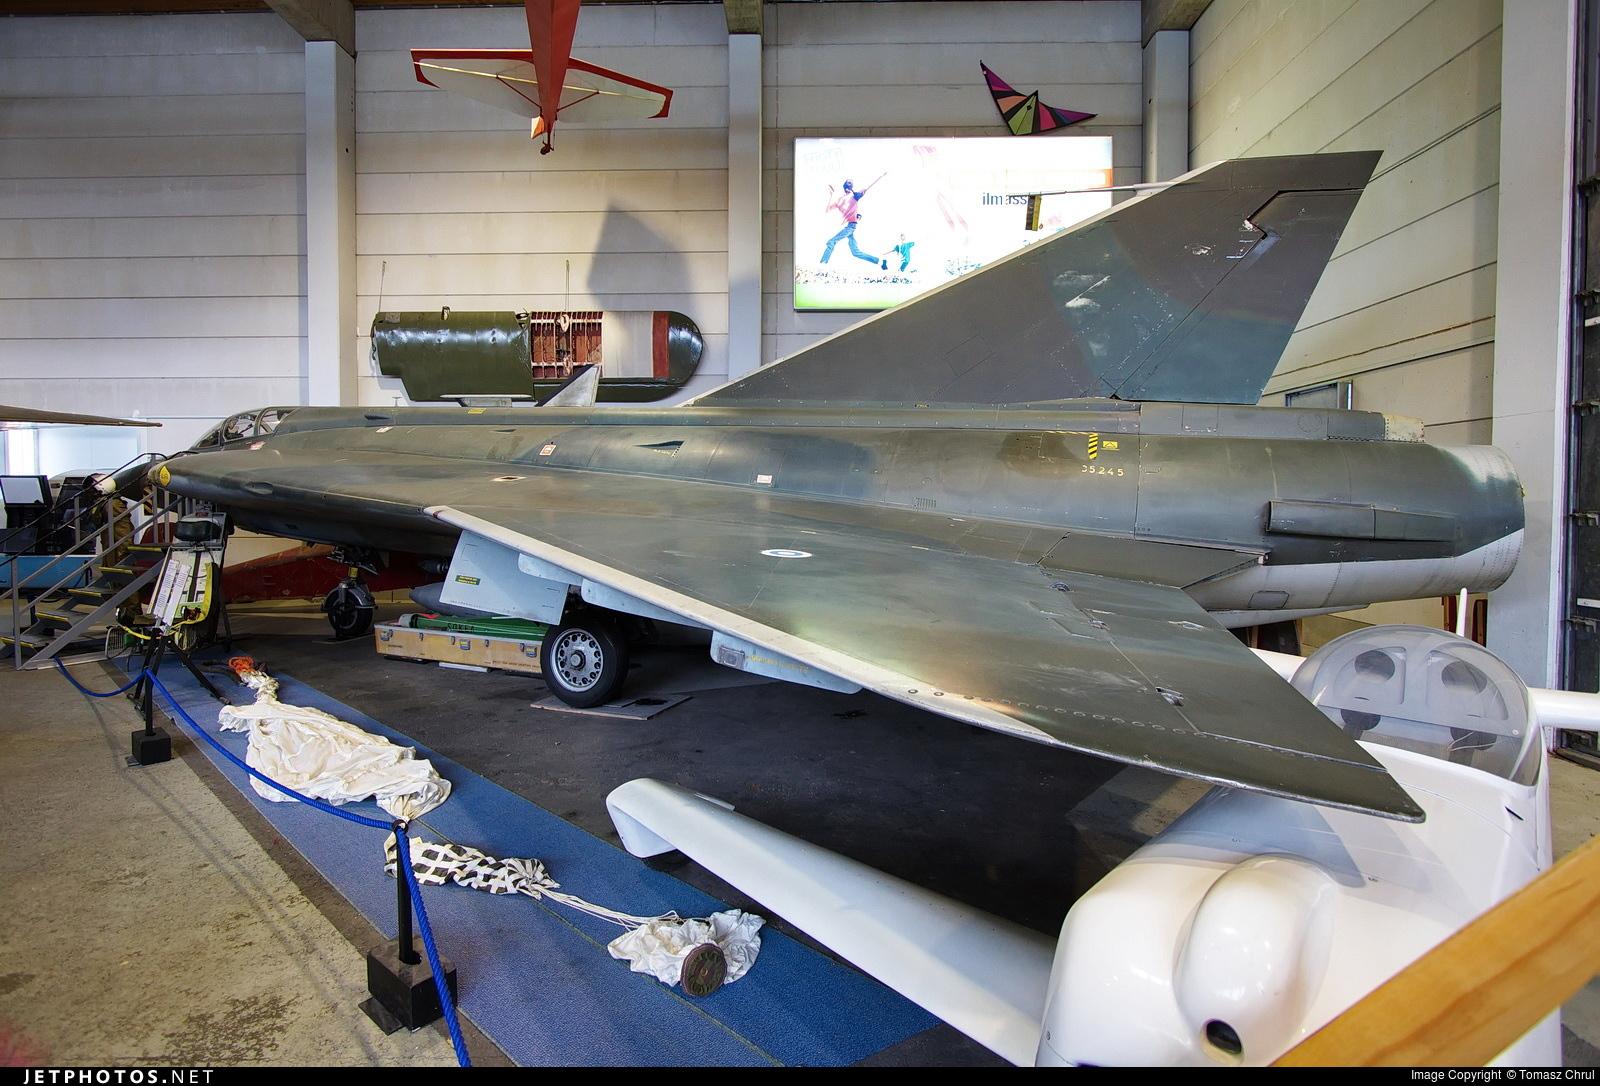 DK-206 - Saab J-35S Draken - Finland - Air Force